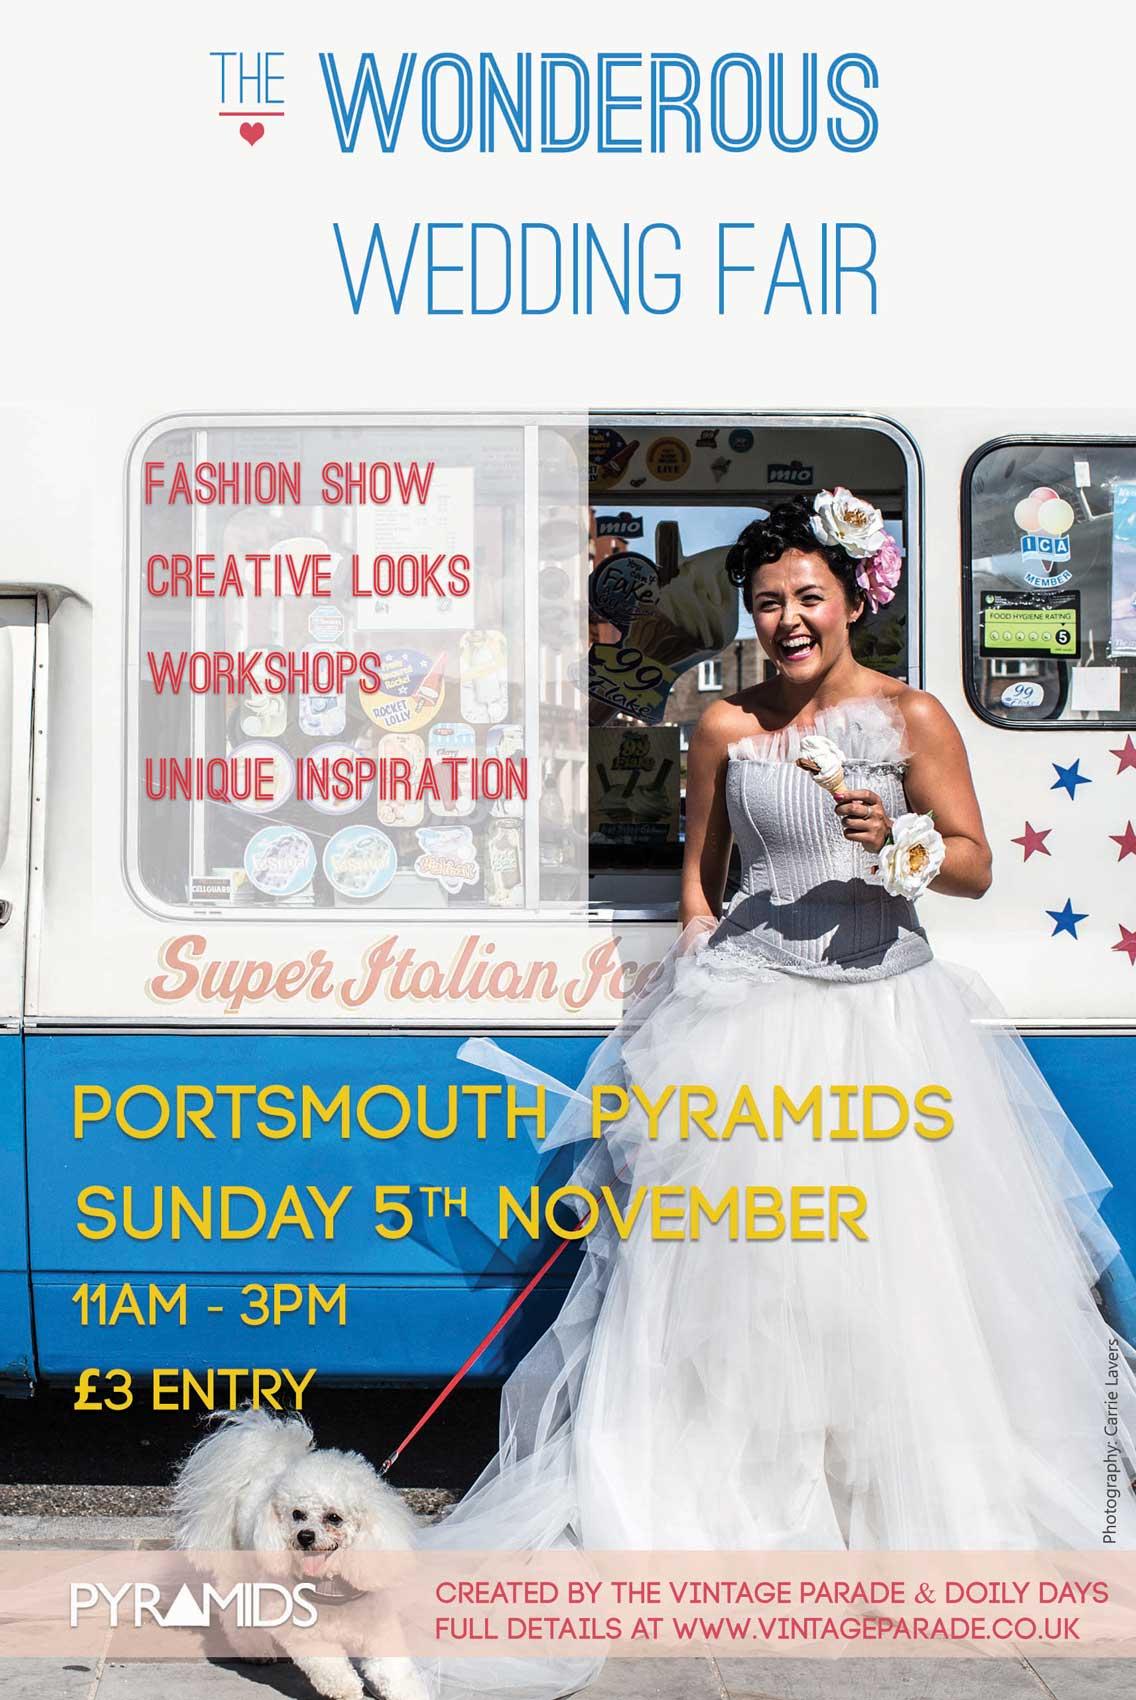 The Wonderous Wedding Fair